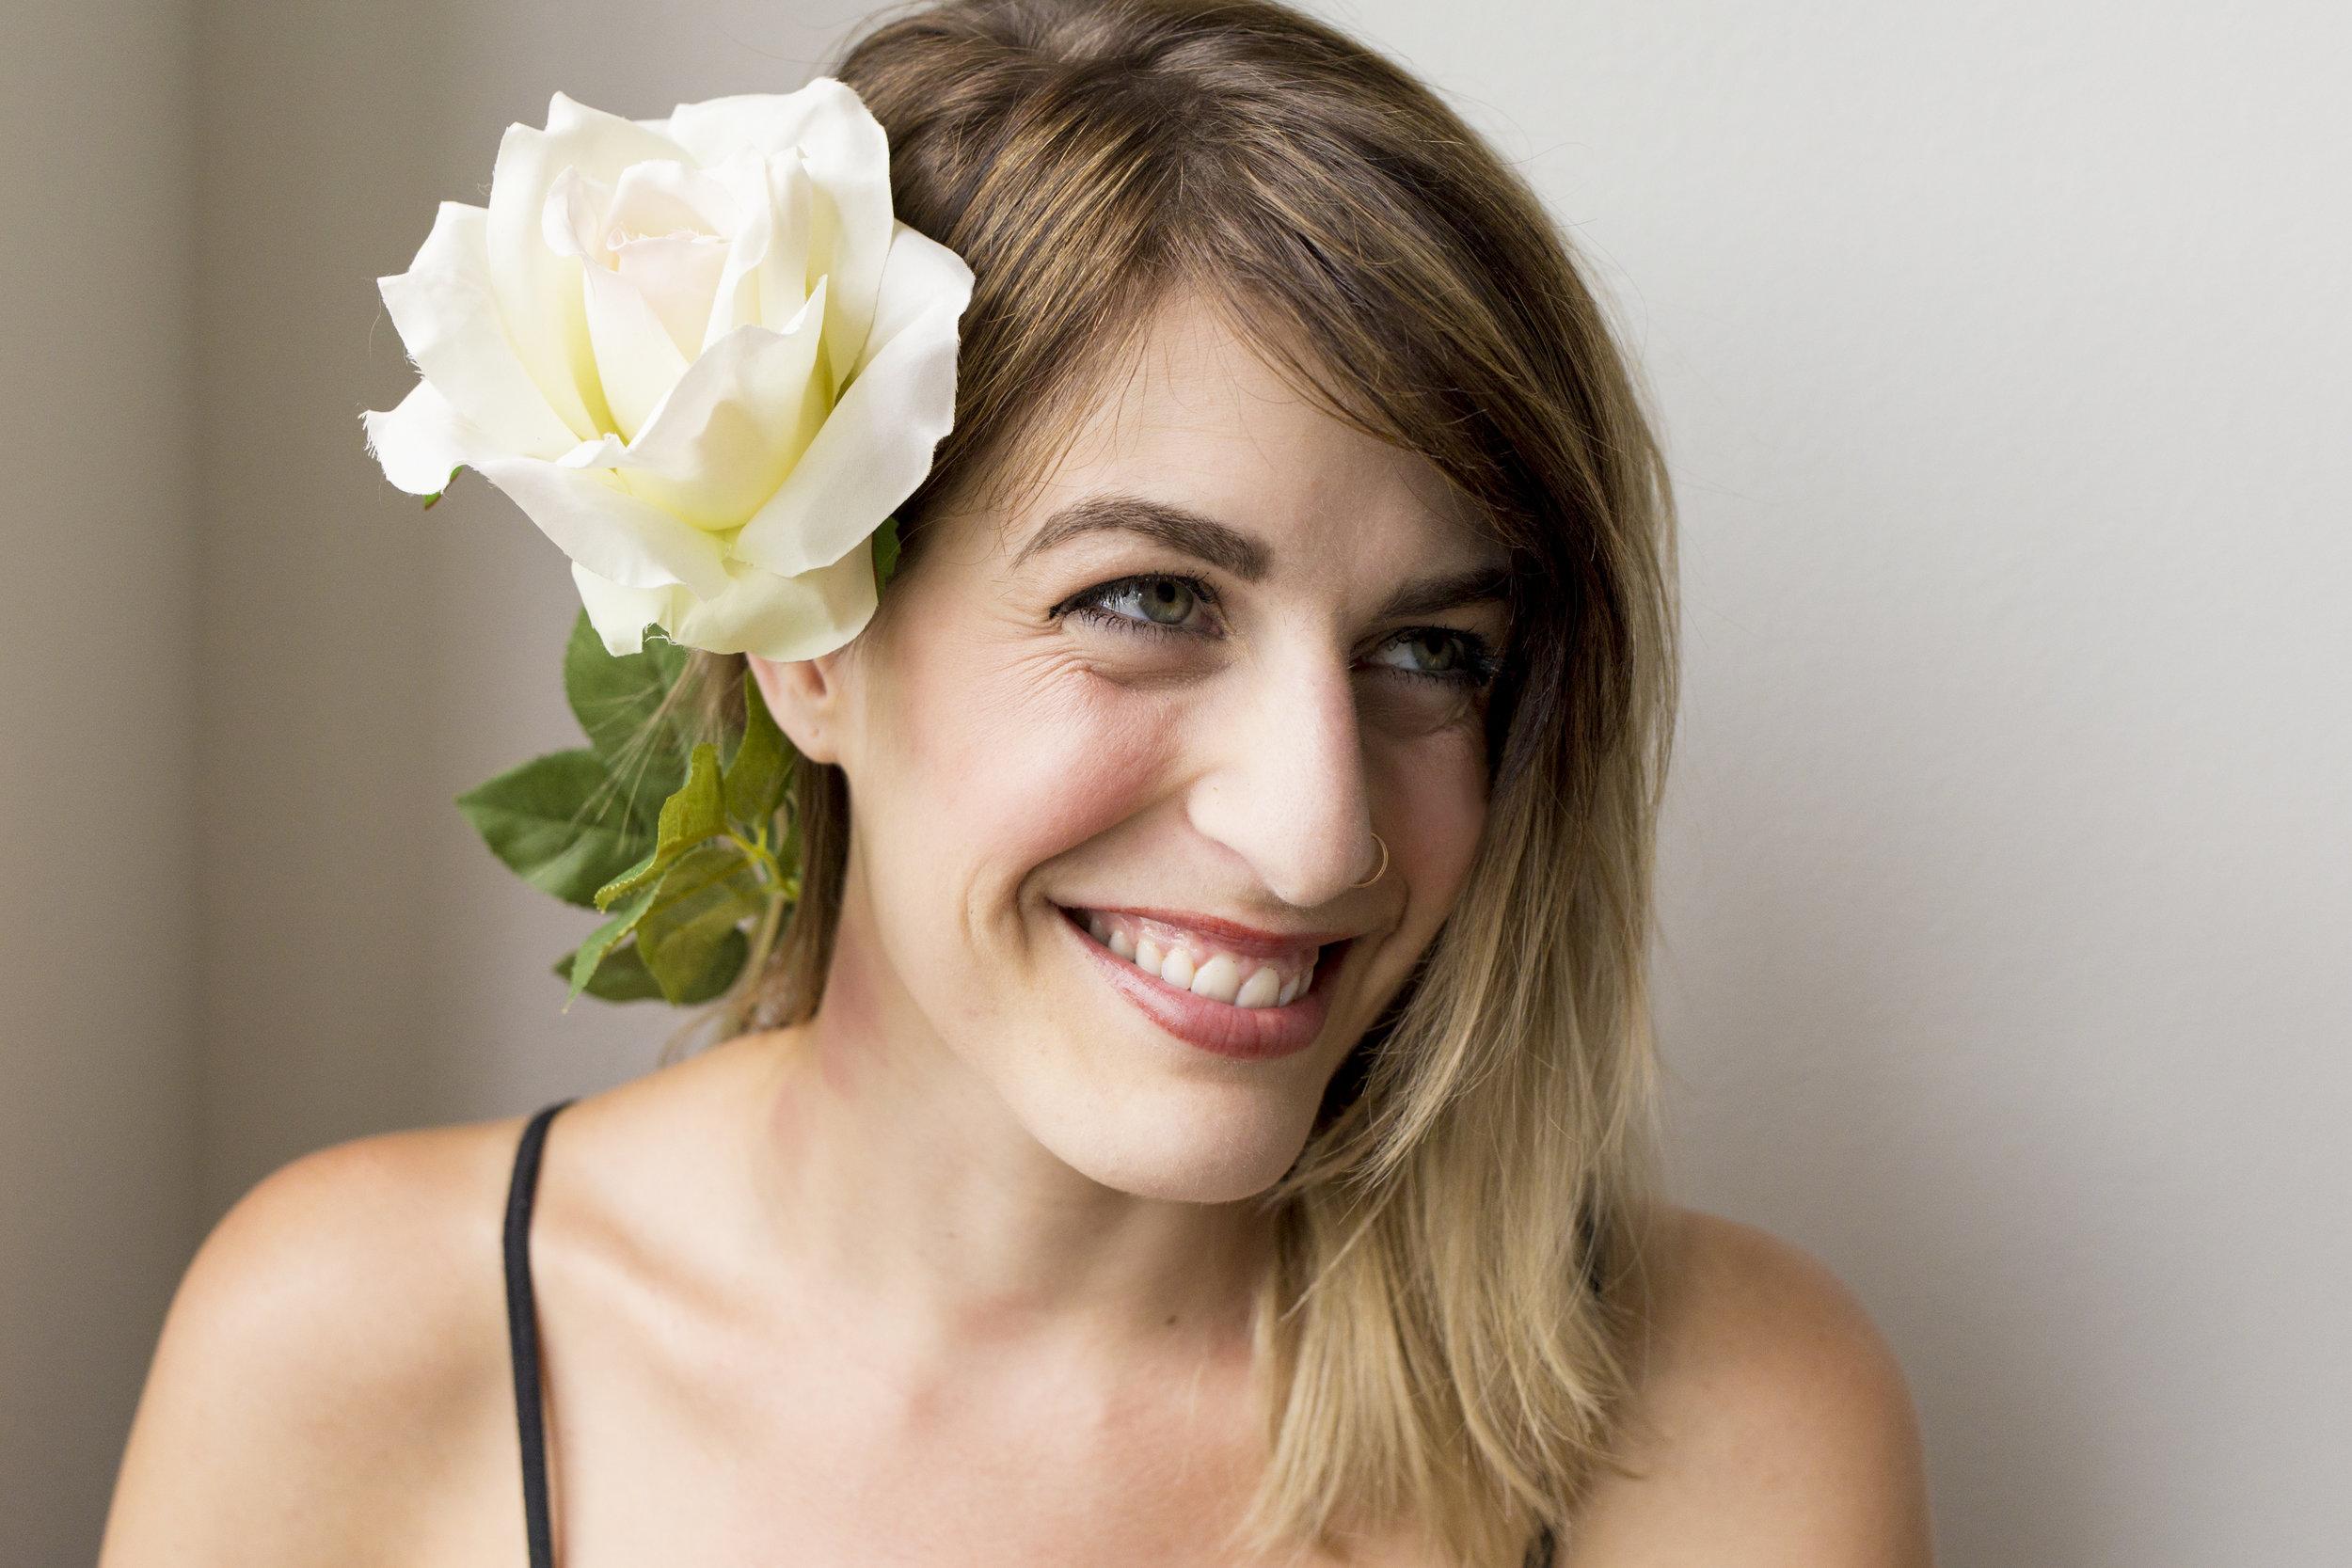 Sofia Angelina Photography Flower Portrait Smile 1 copy.jpg